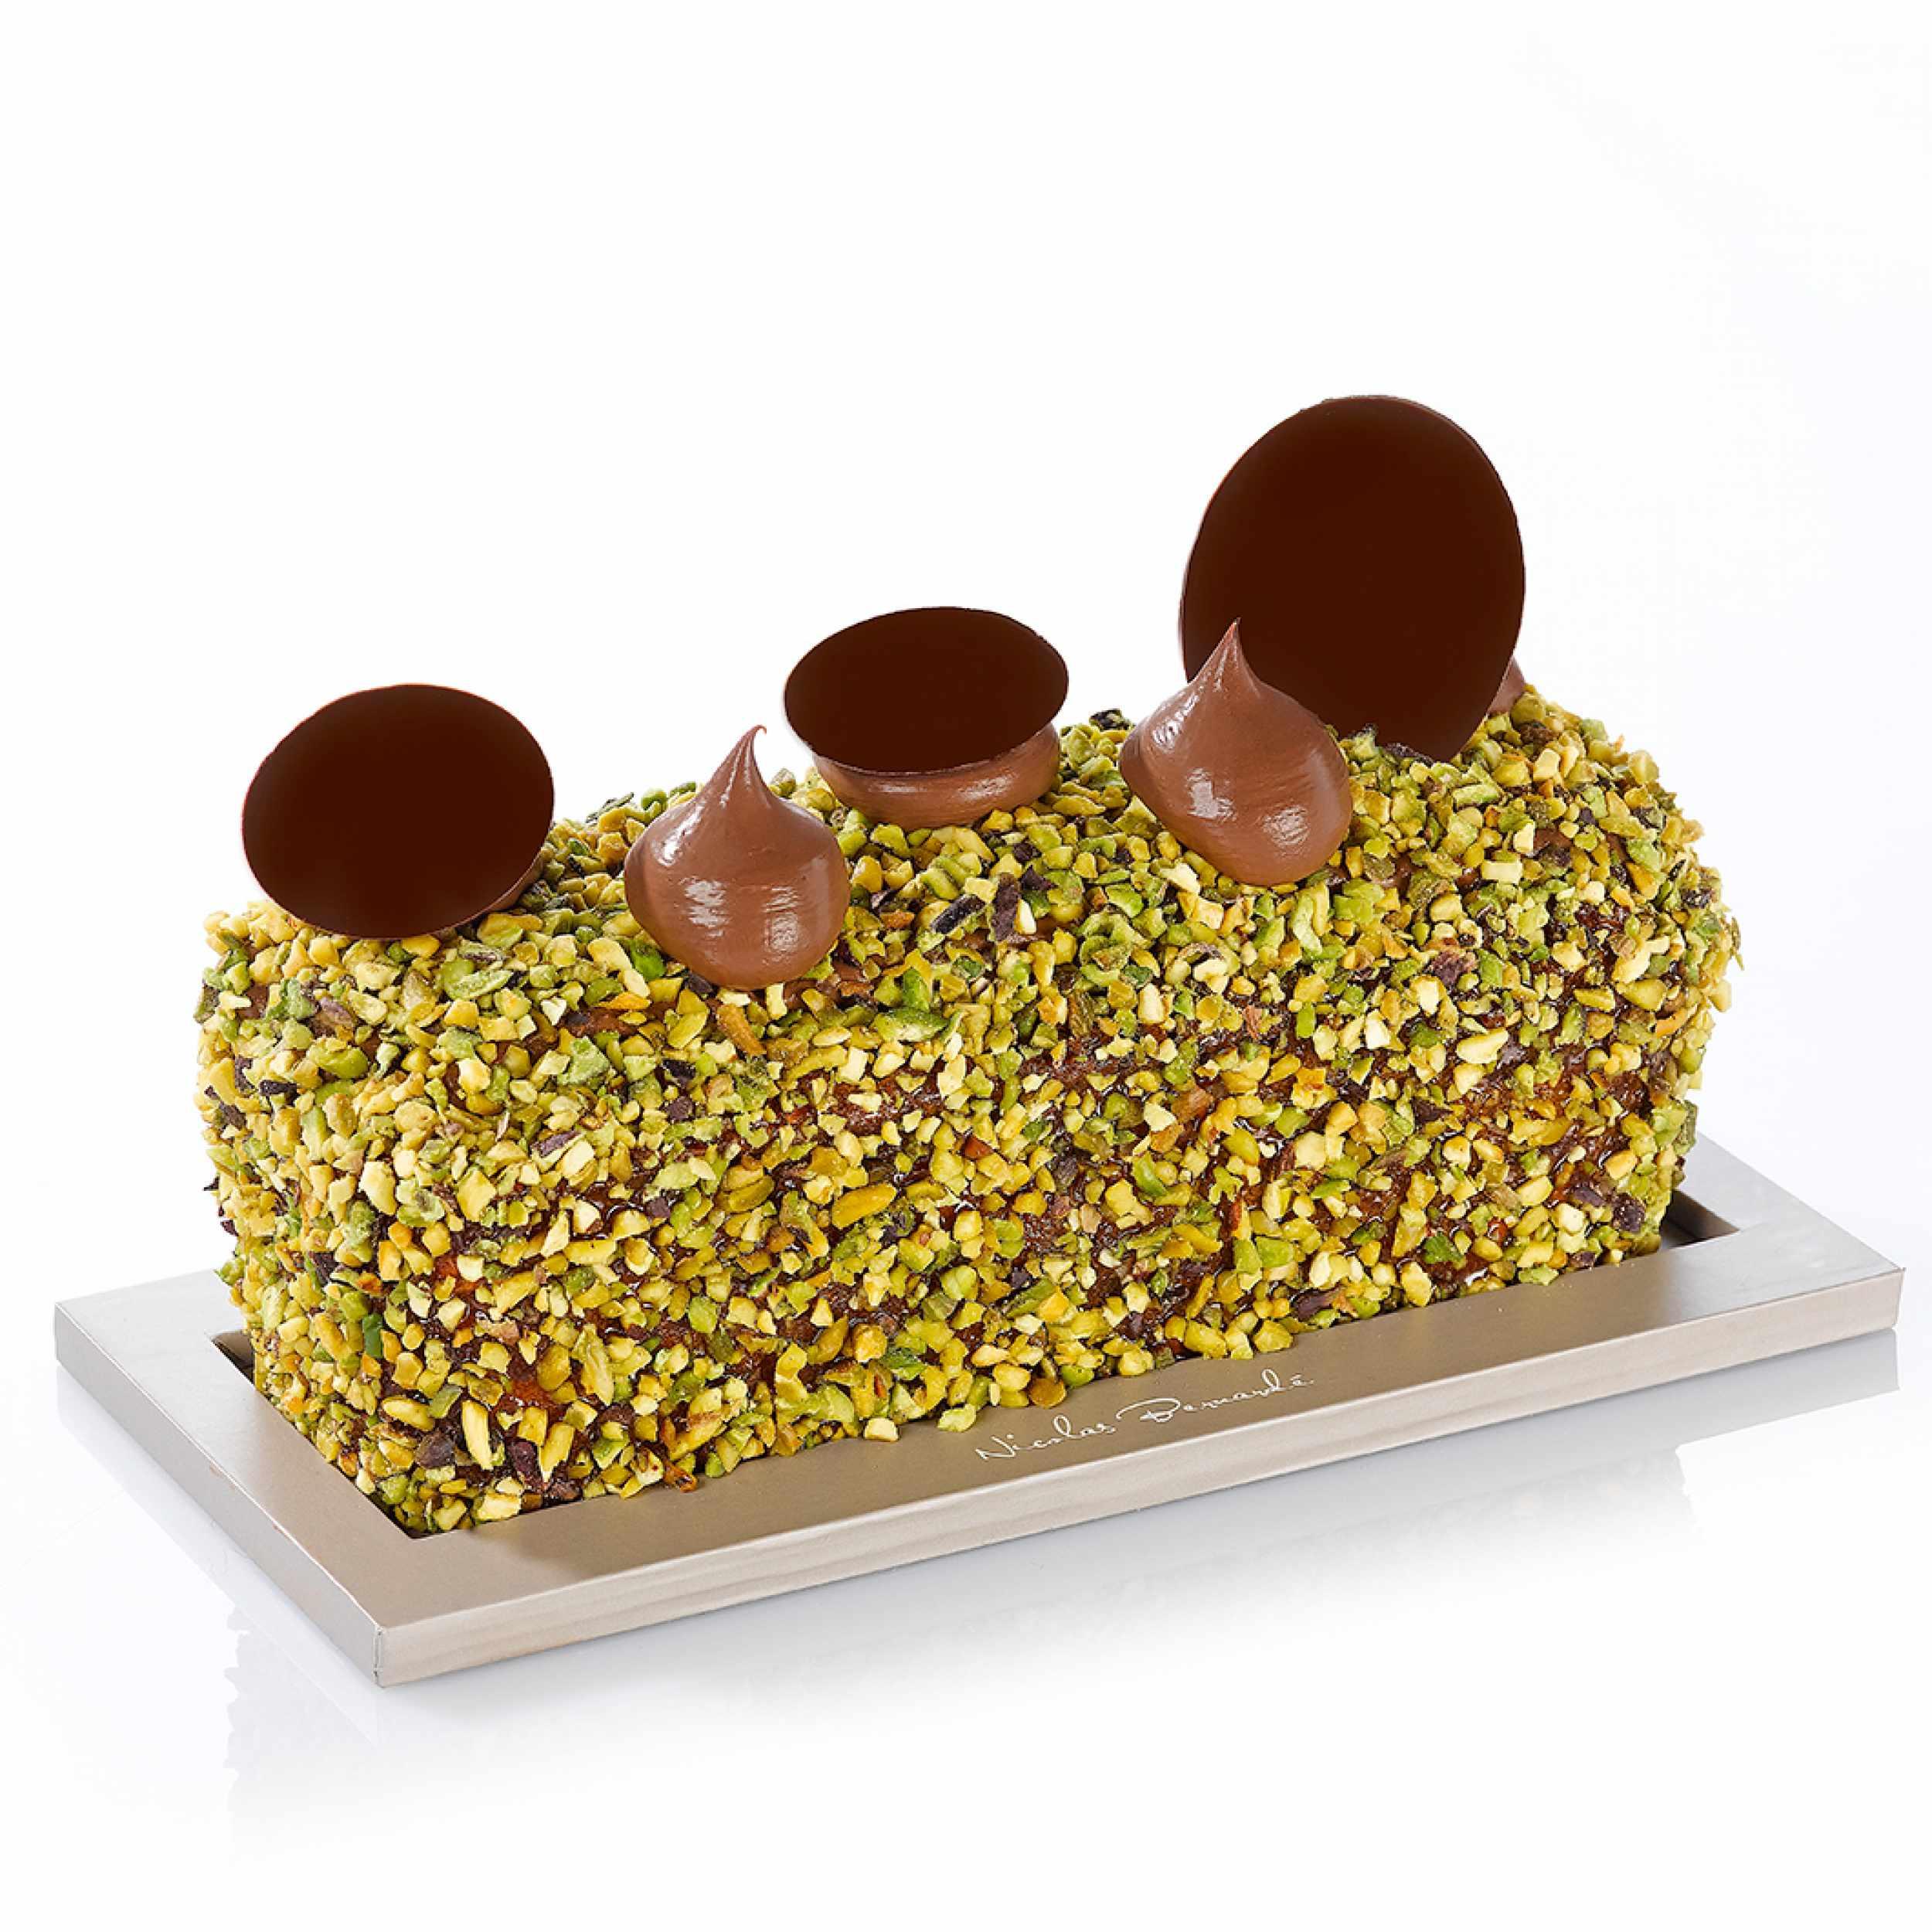 cake-pistache-fruits-secs.jpg